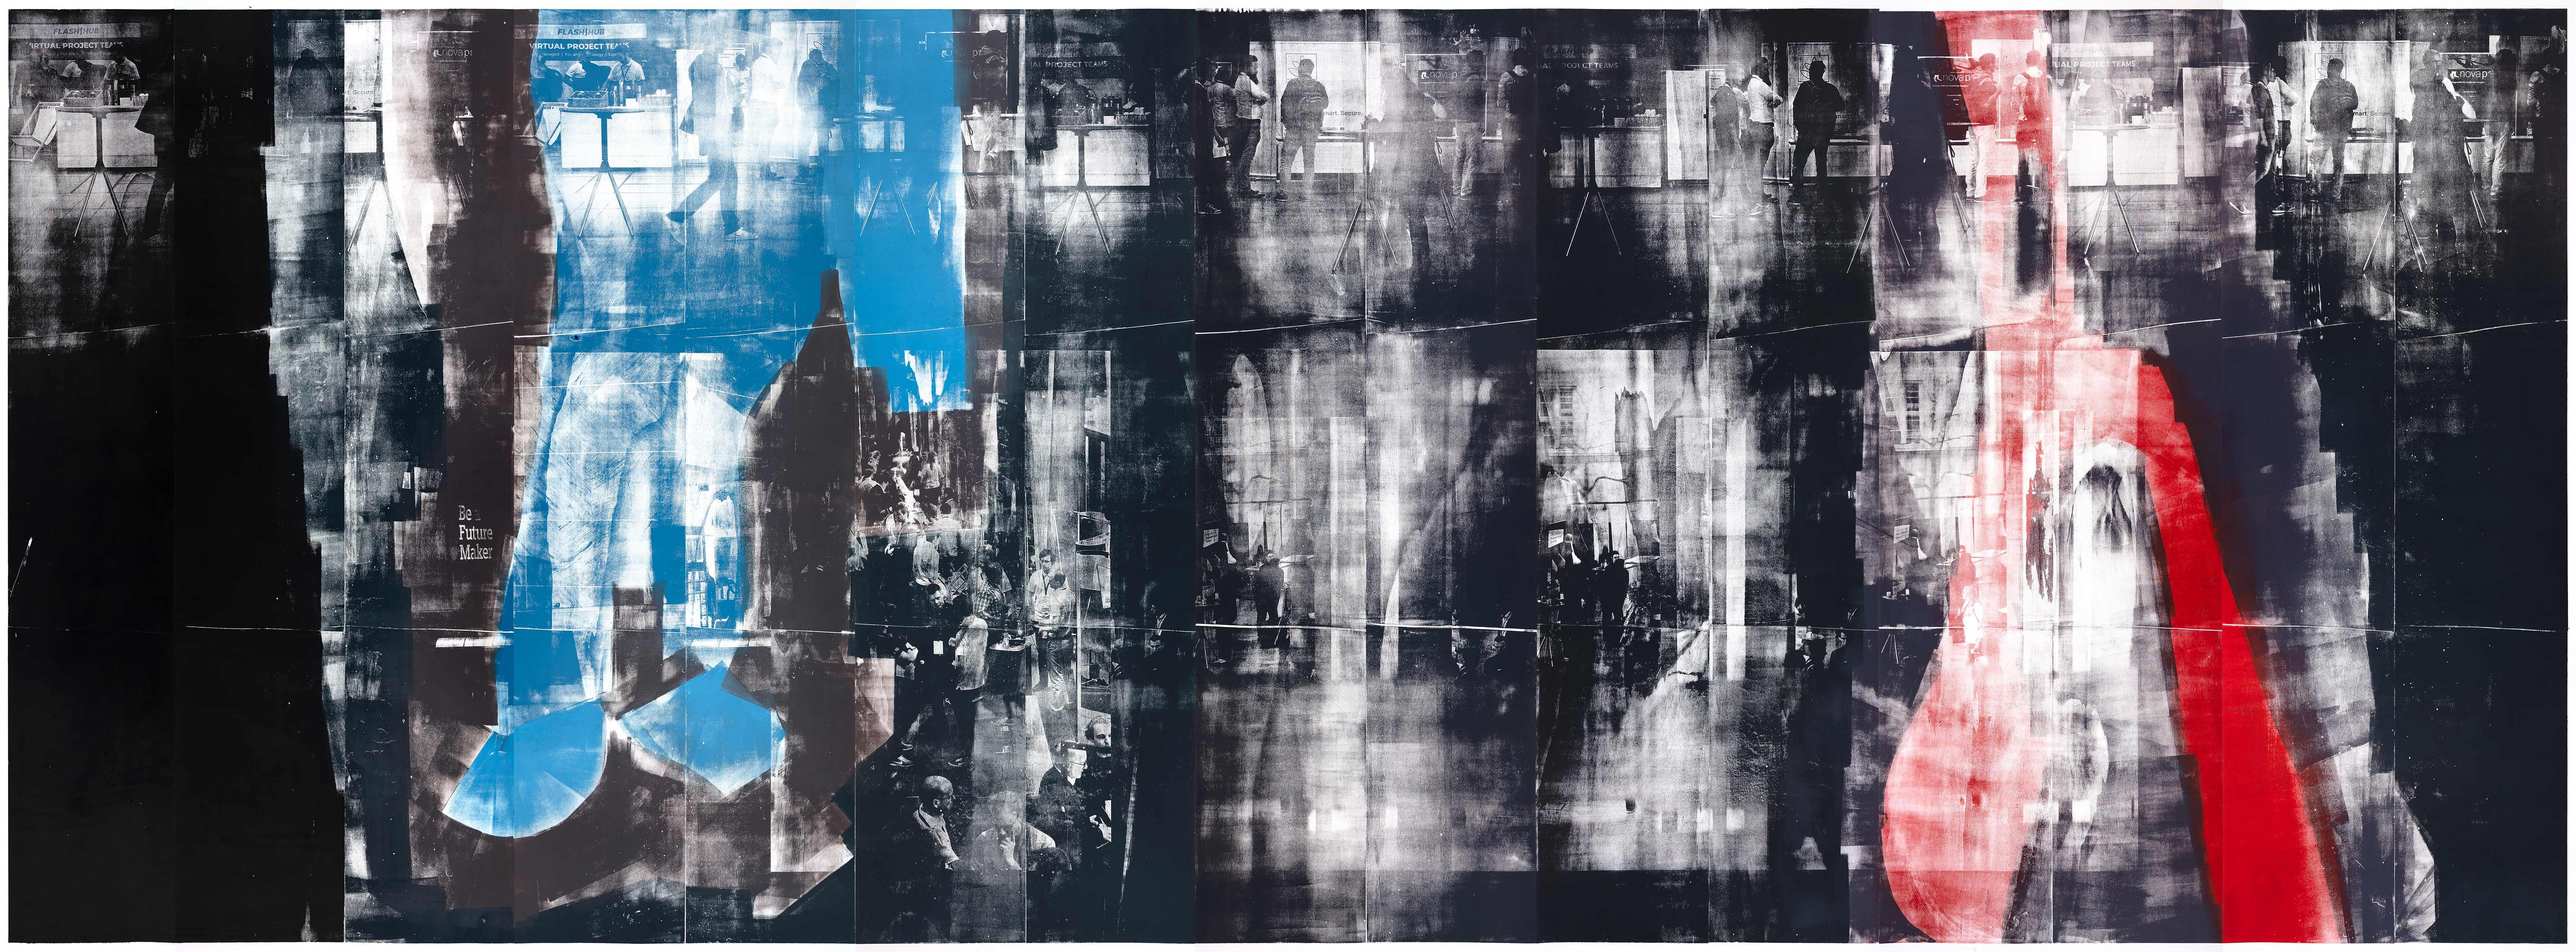 Situation, 2019, wood engraving, 274 x 701 cm, Genaro Strobel Kunstwerk